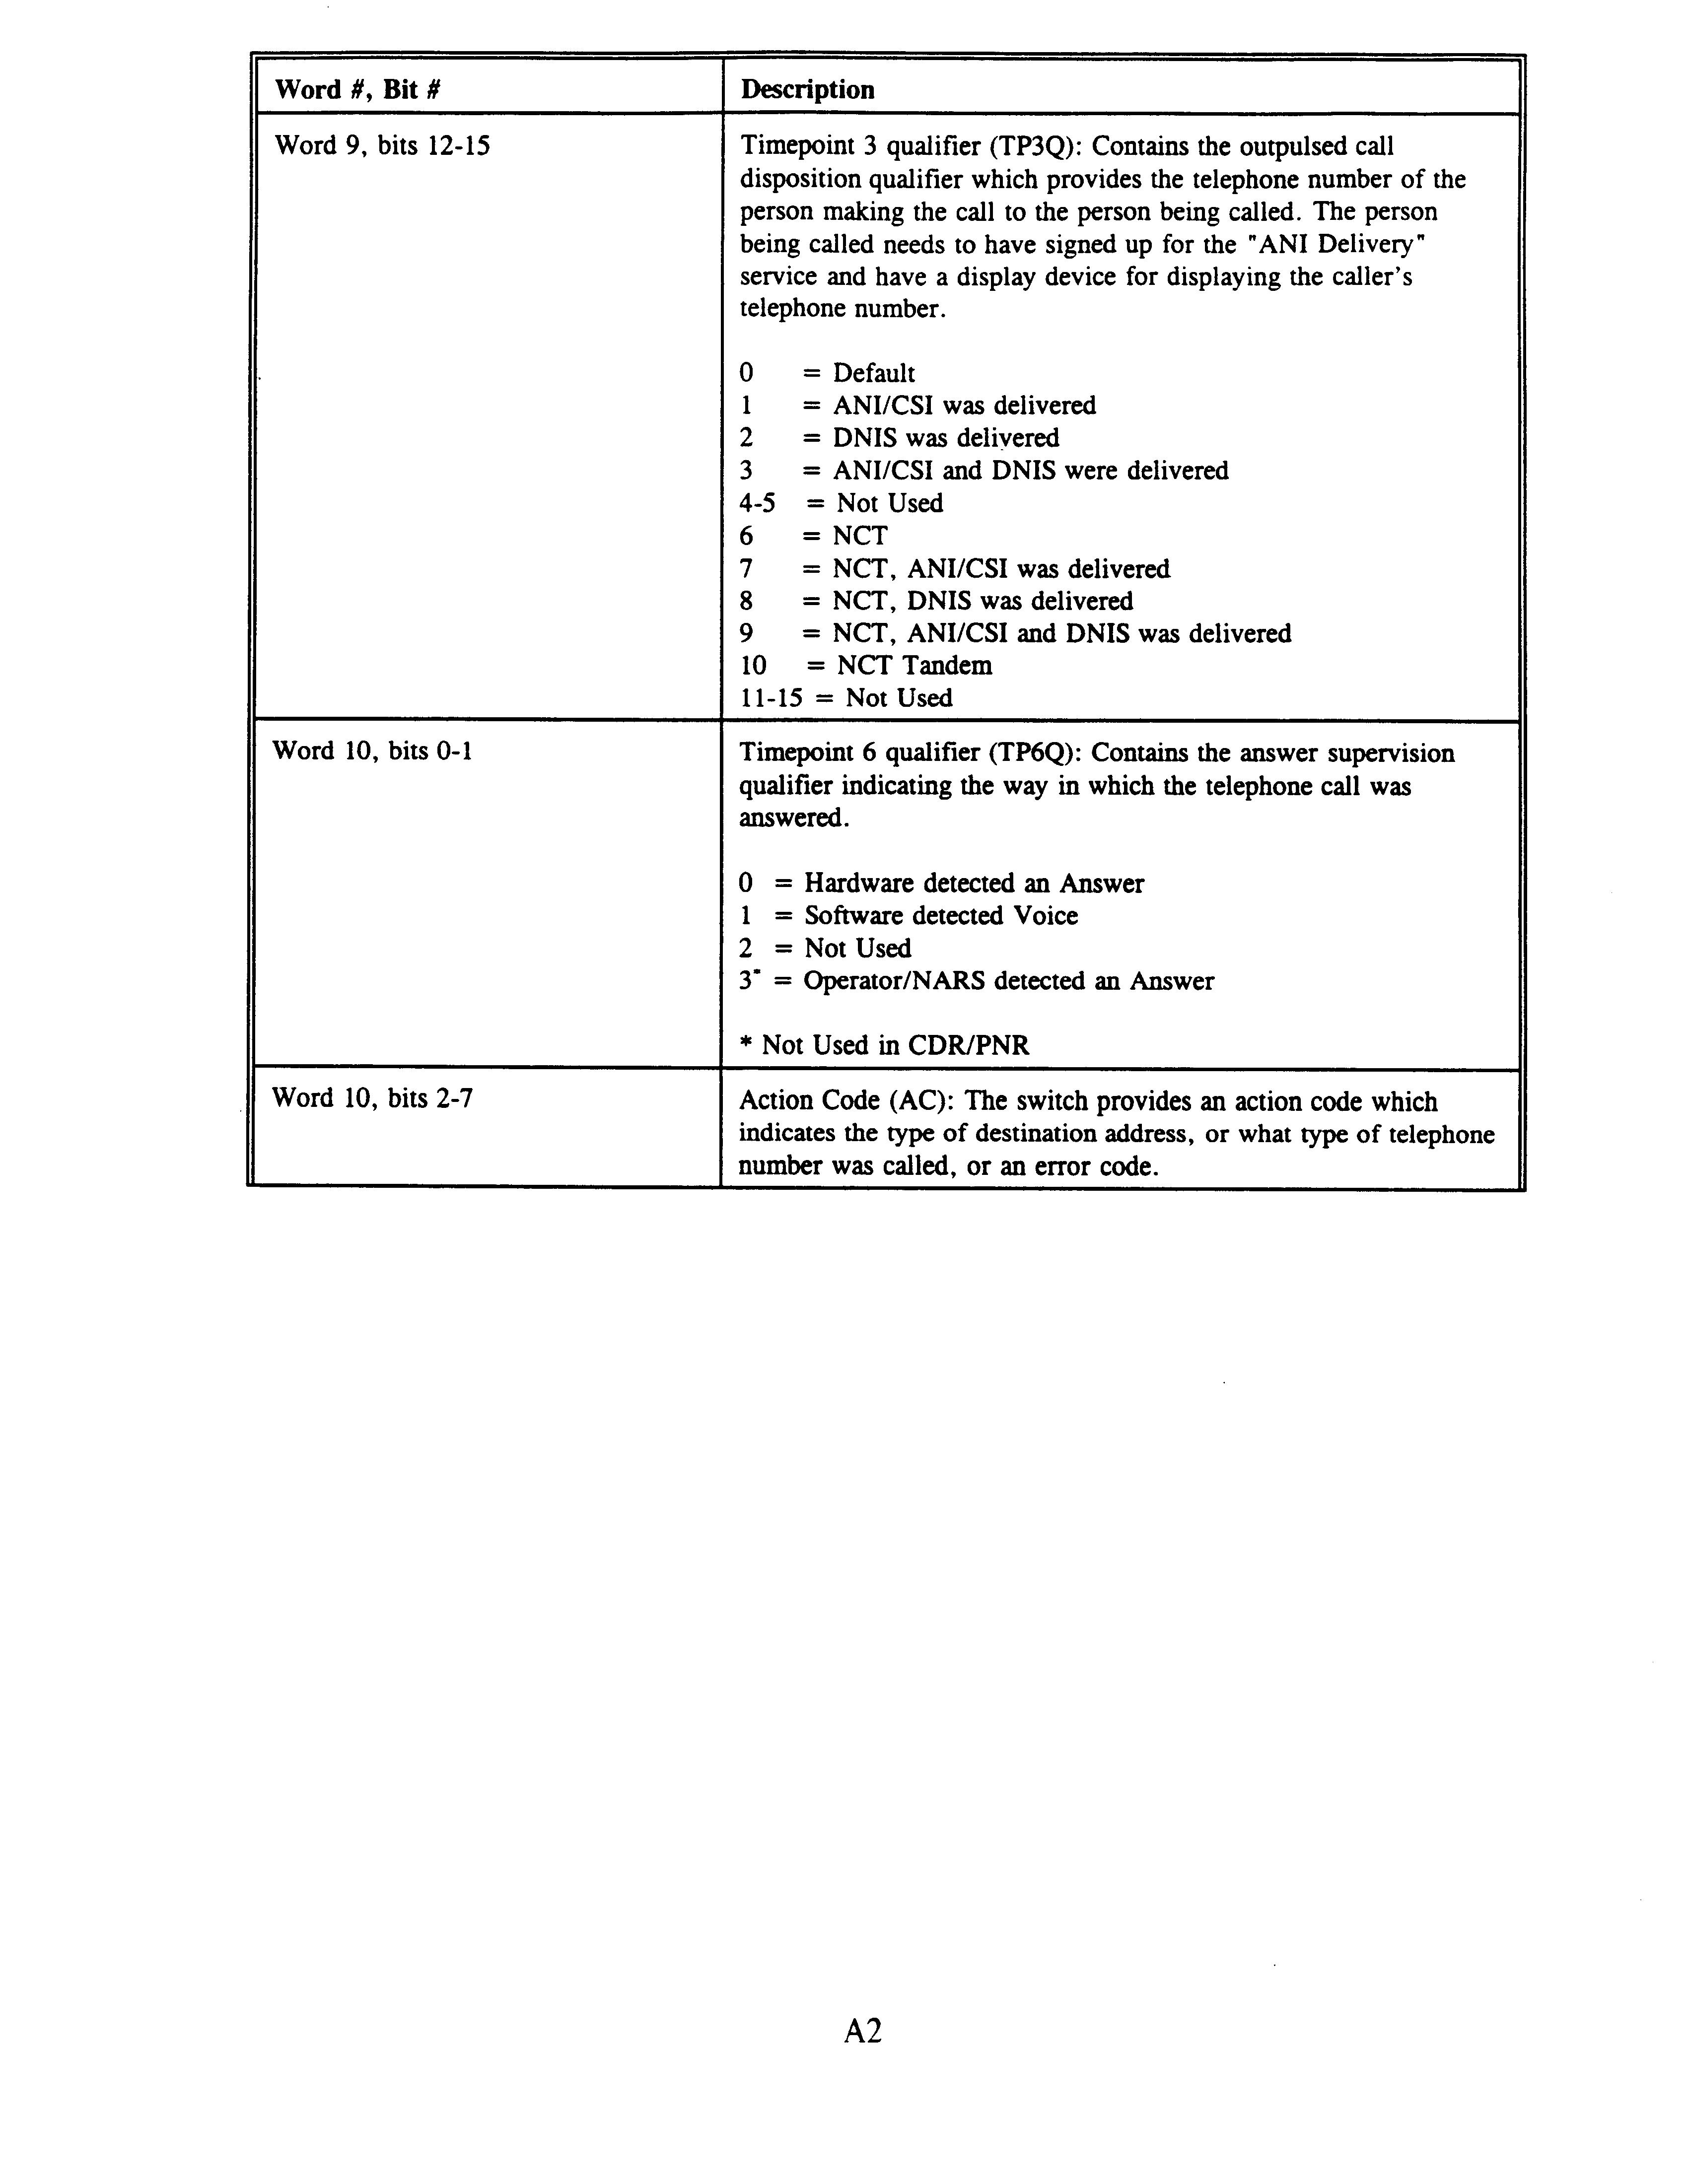 ENUM TÉLÉCHARGER API.DLL SVR